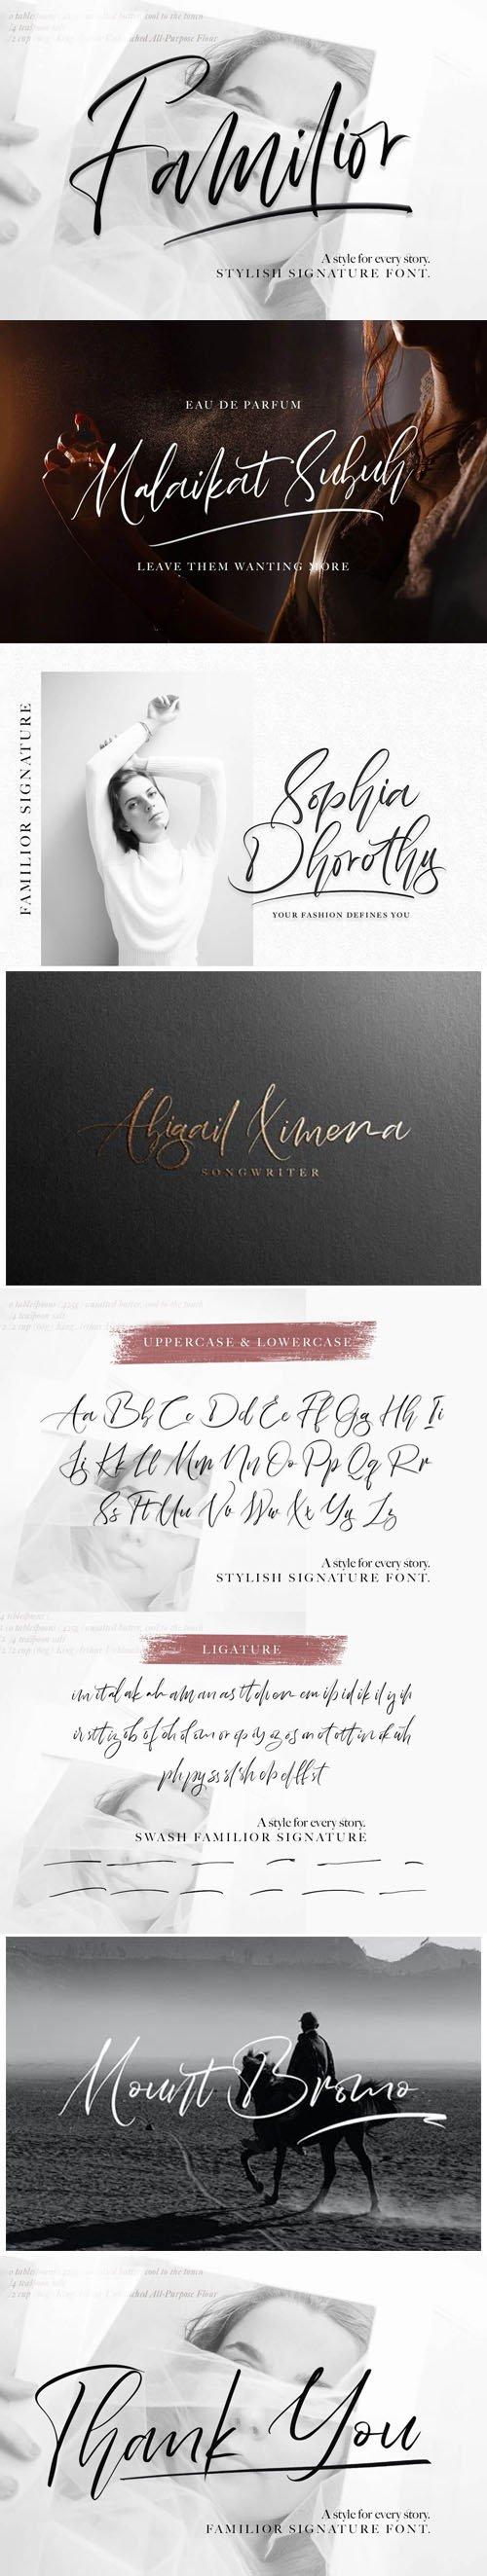 Familior - Stylish Signature Font [2-Weights]